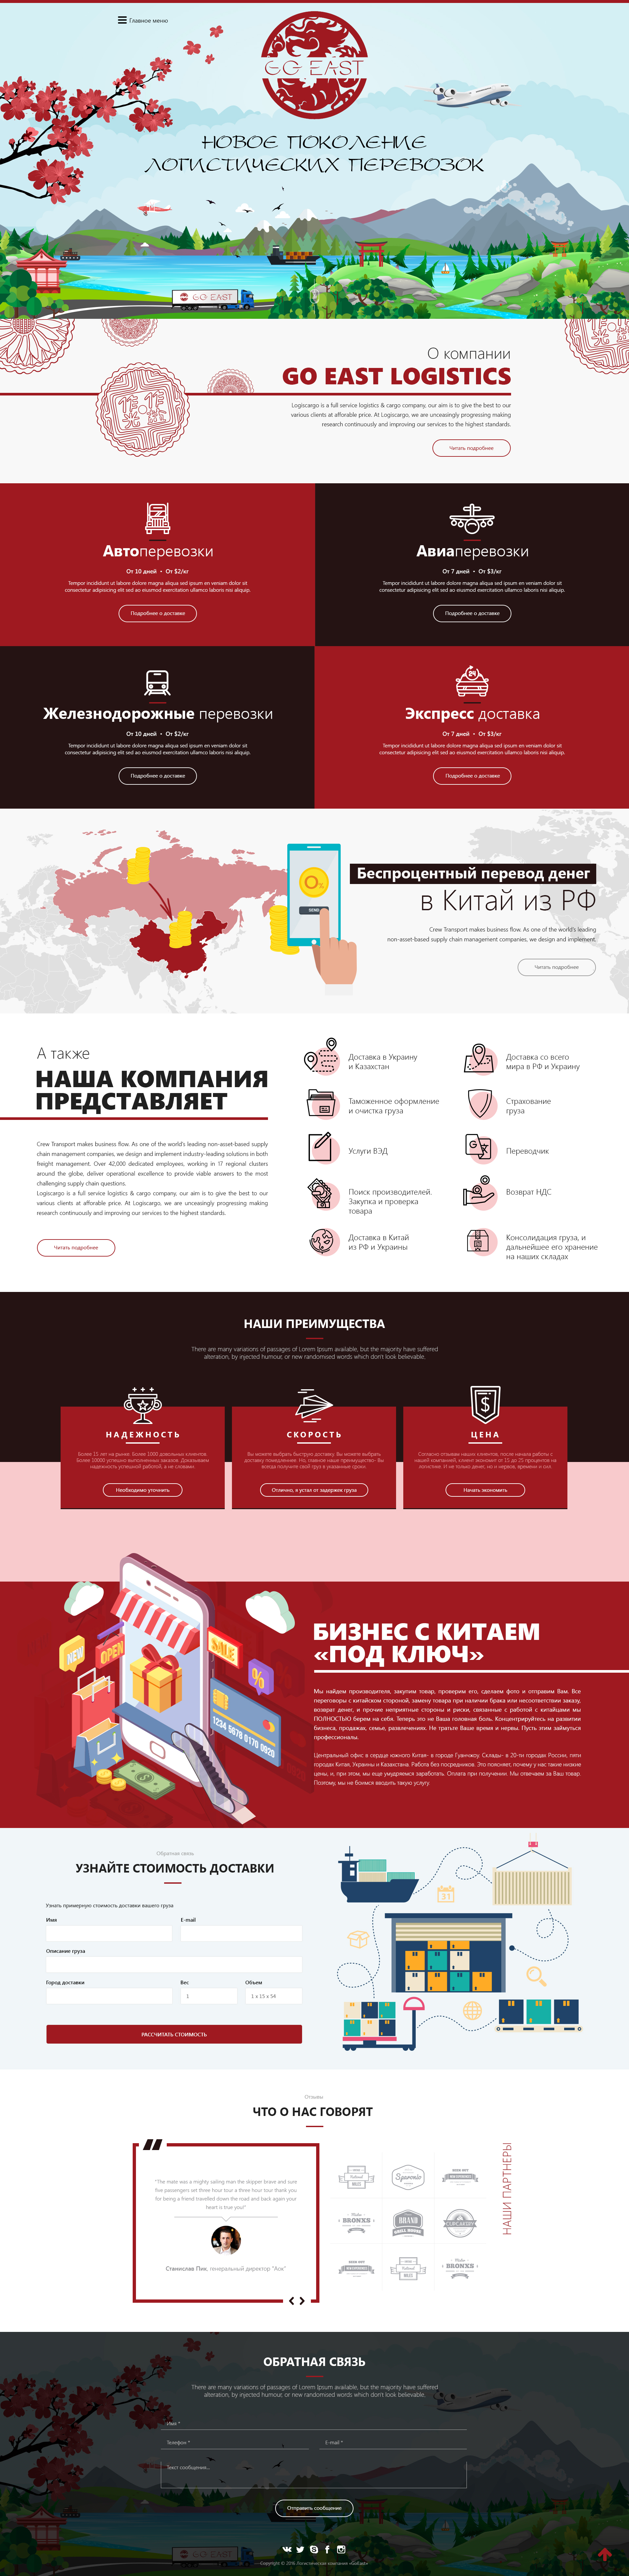 https://vladimir-alexandrov.com/wp-content/uploads/2017/10/site_GoEast_Main.jpg